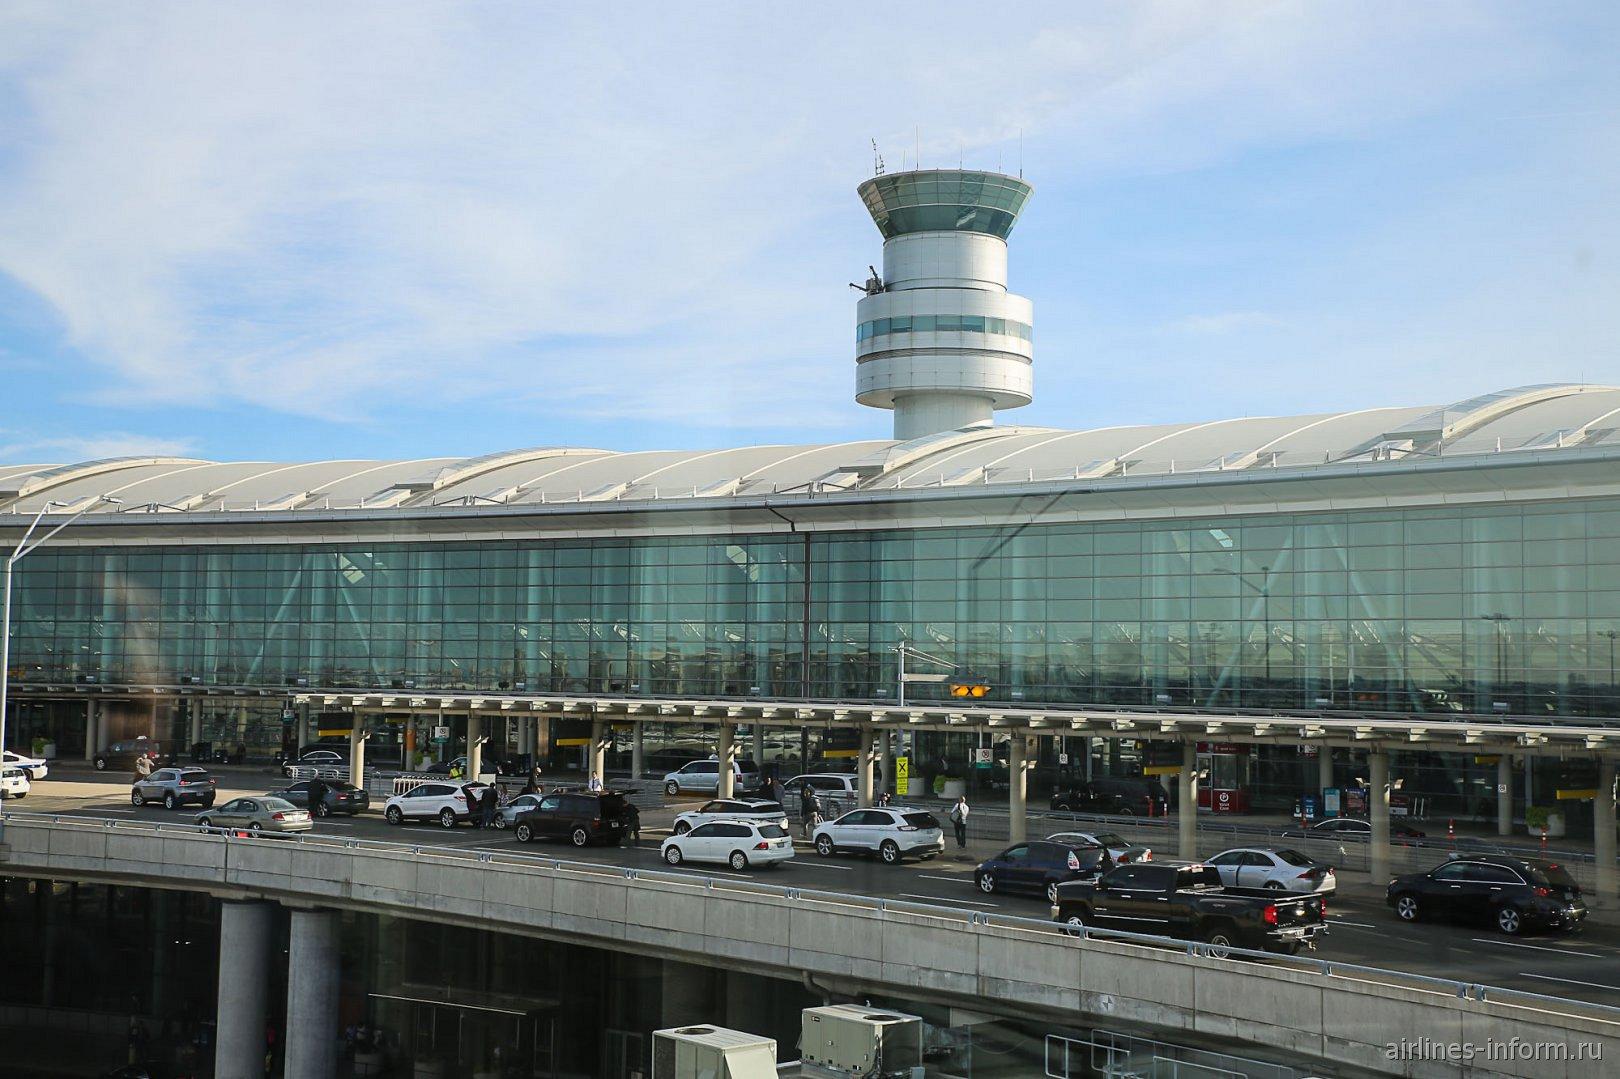 Терминал 1 аэропорта Торонто Лестер Пирсон